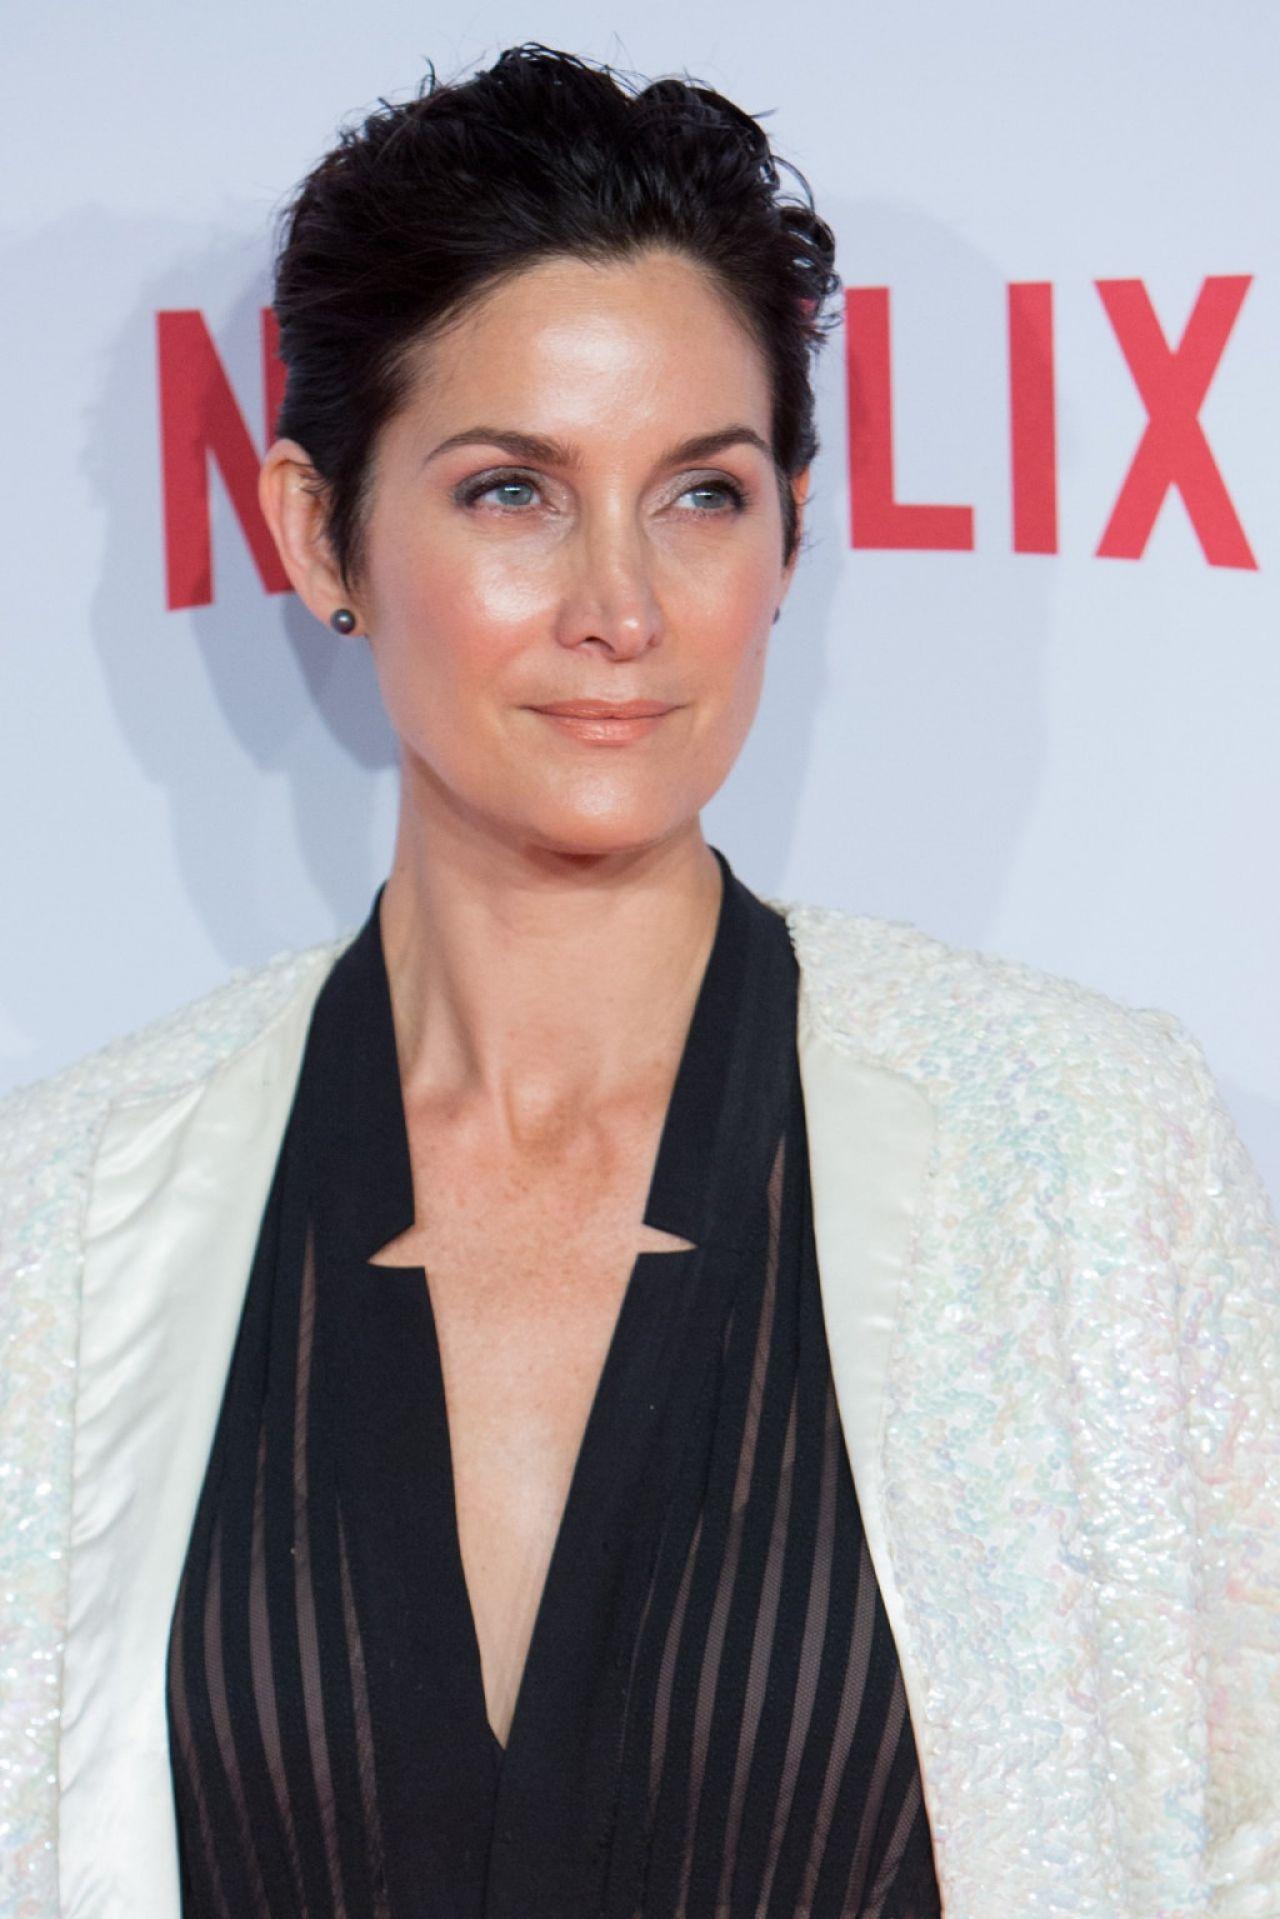 Carrie-Anne Moss - Netflix Spains Presentation Red Carpet